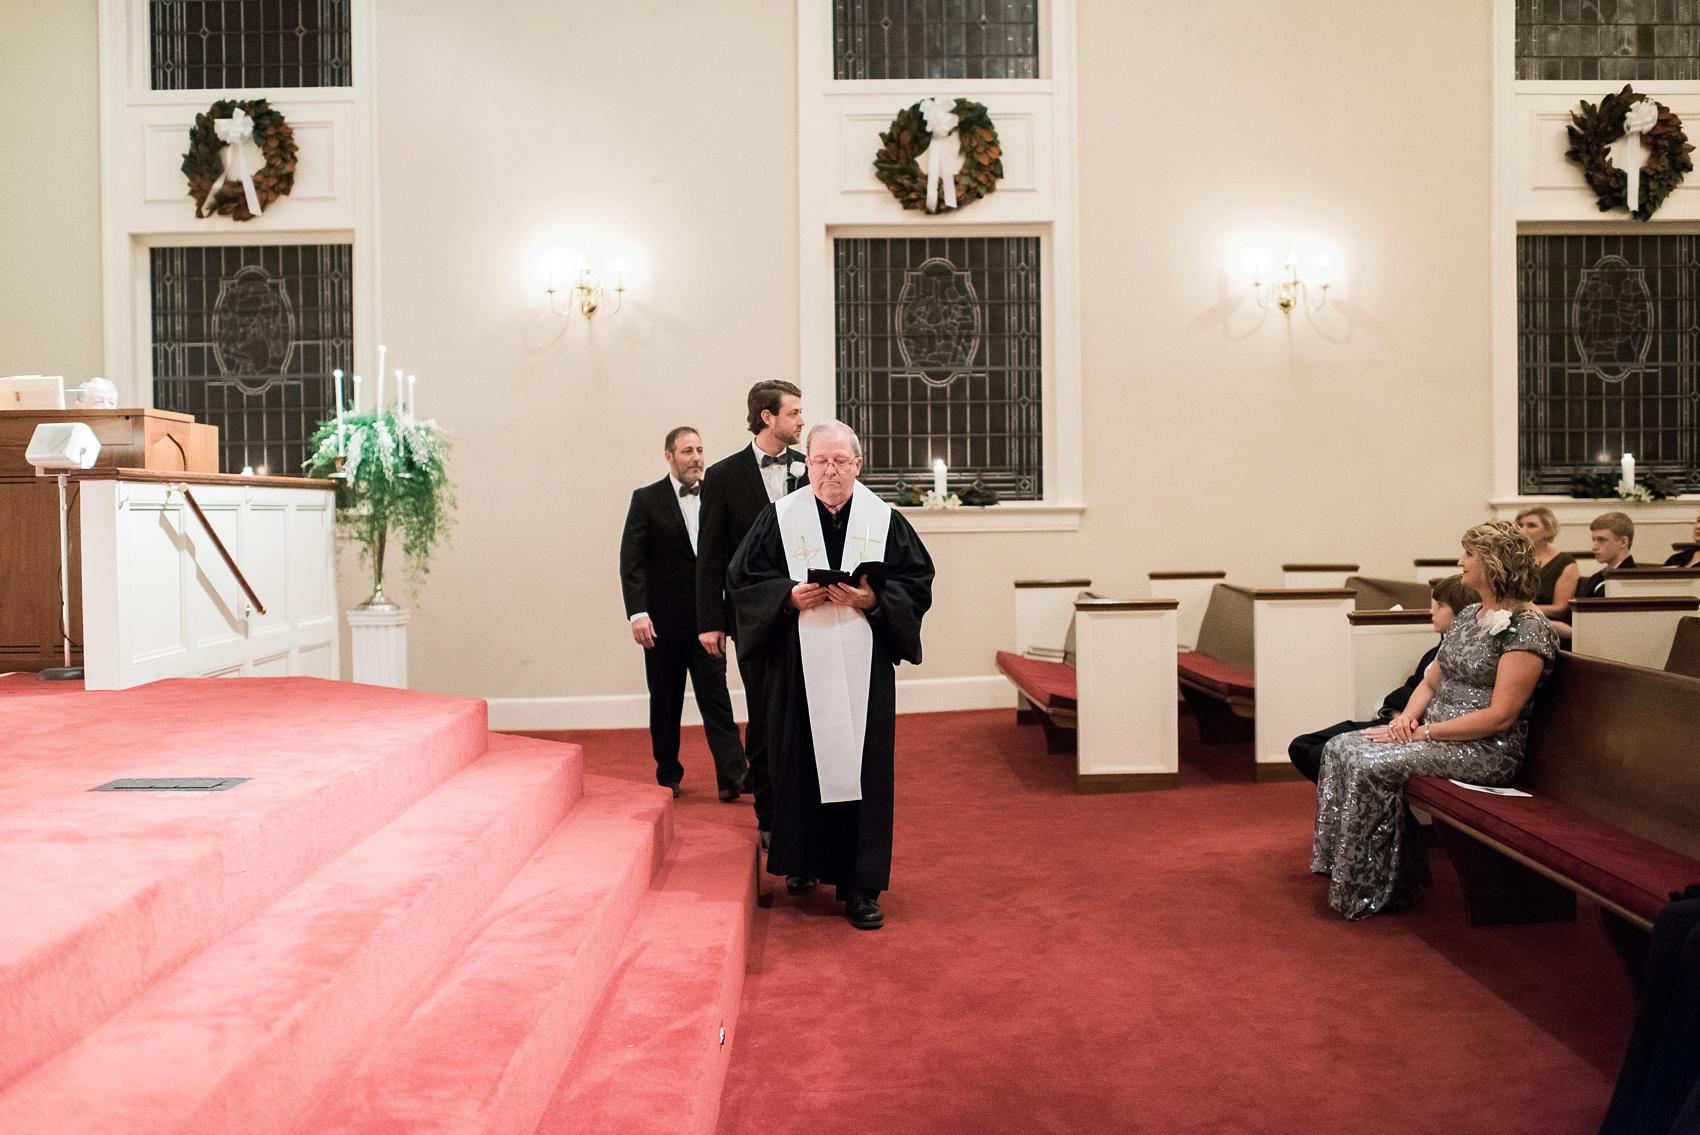 South_carolina_wedding_photographer_0078.jpg